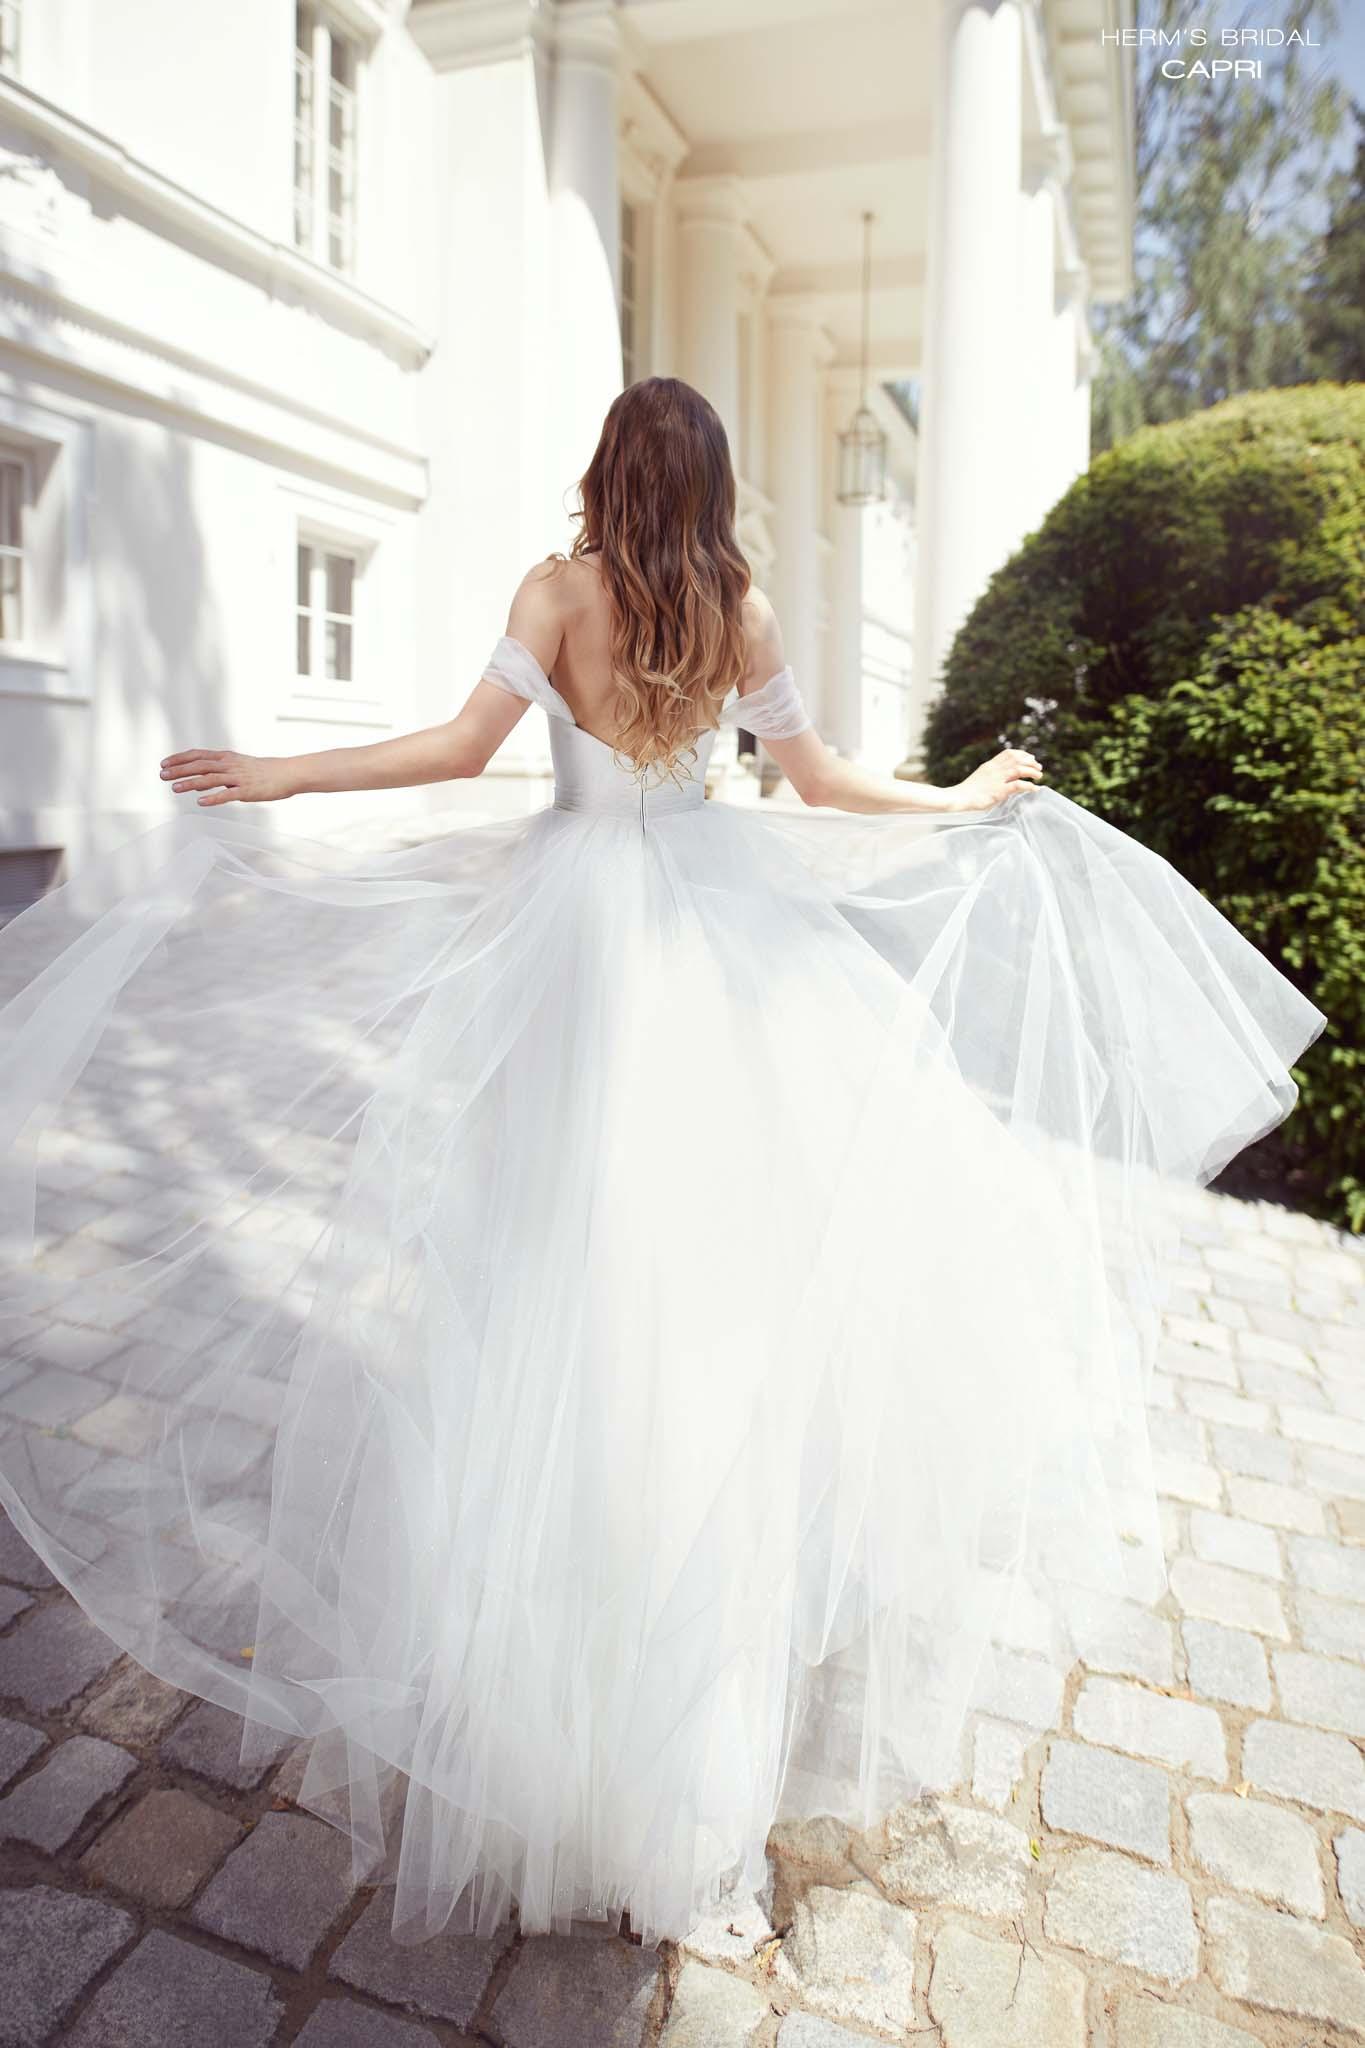 suknia slubna herms bridal Capri